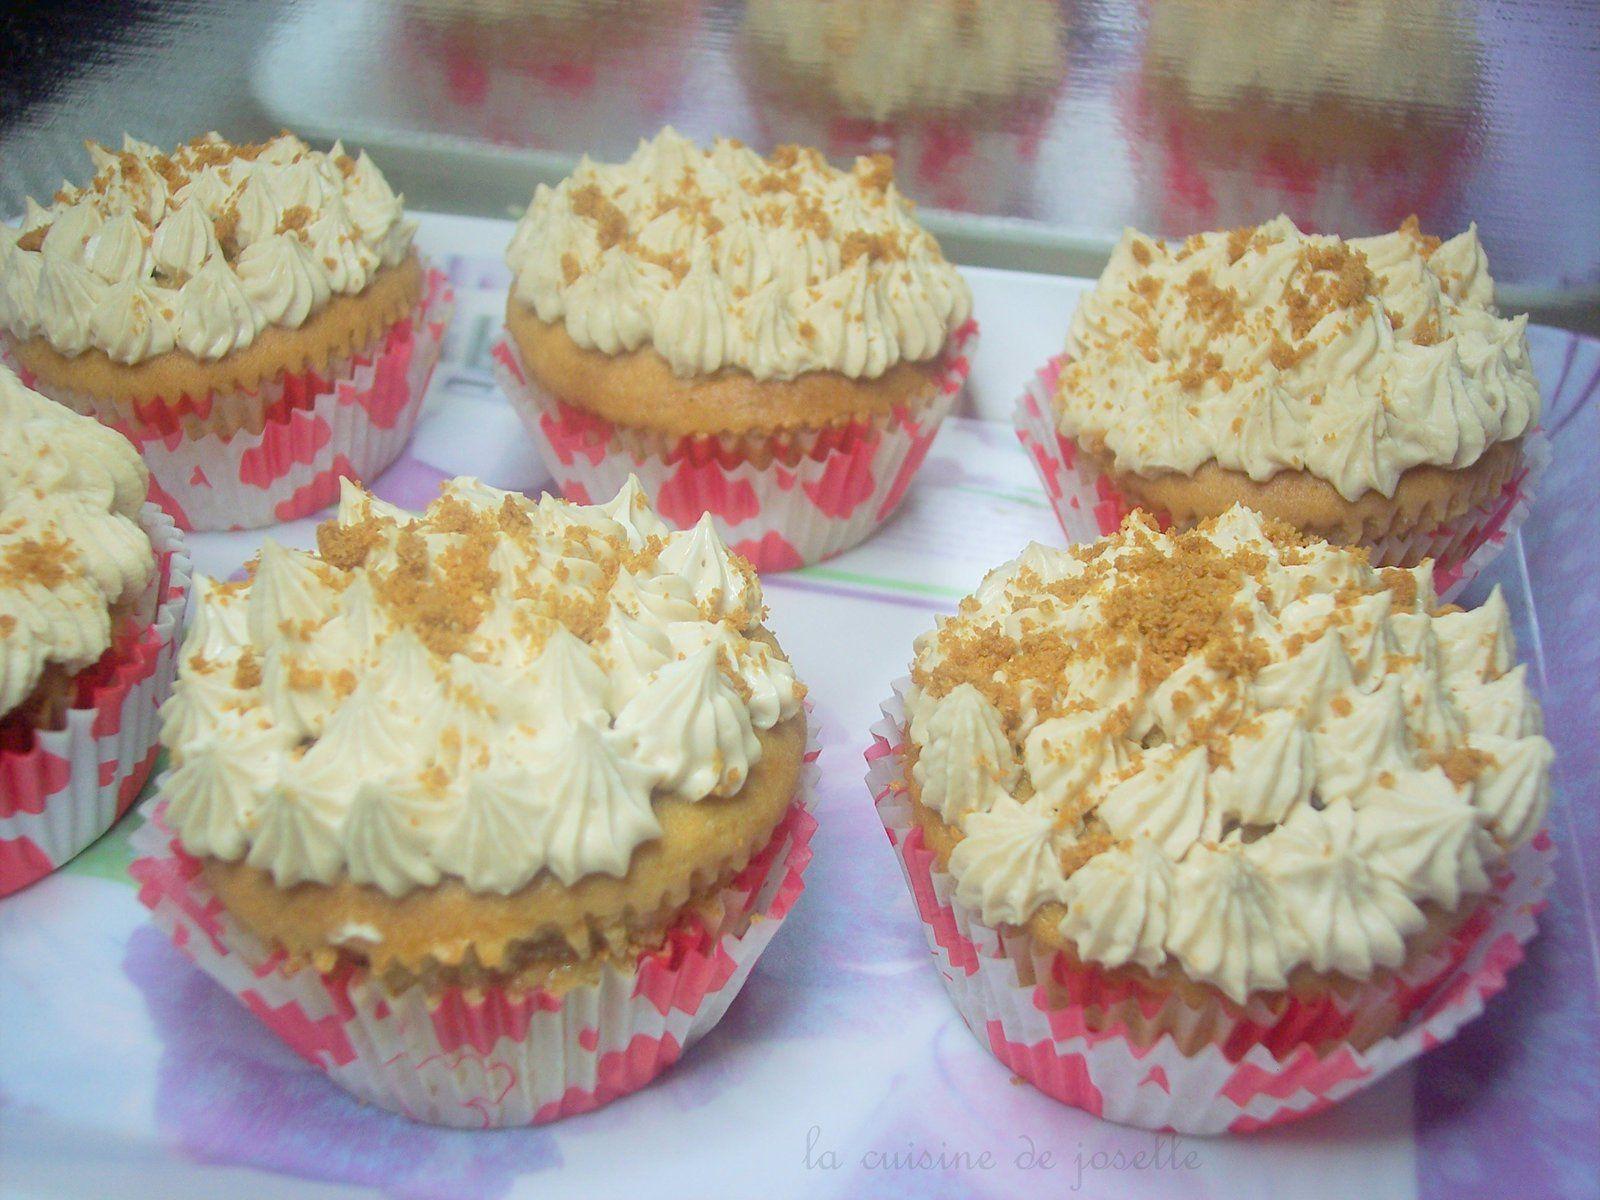 cupcake au speculoos,coeur de framboise